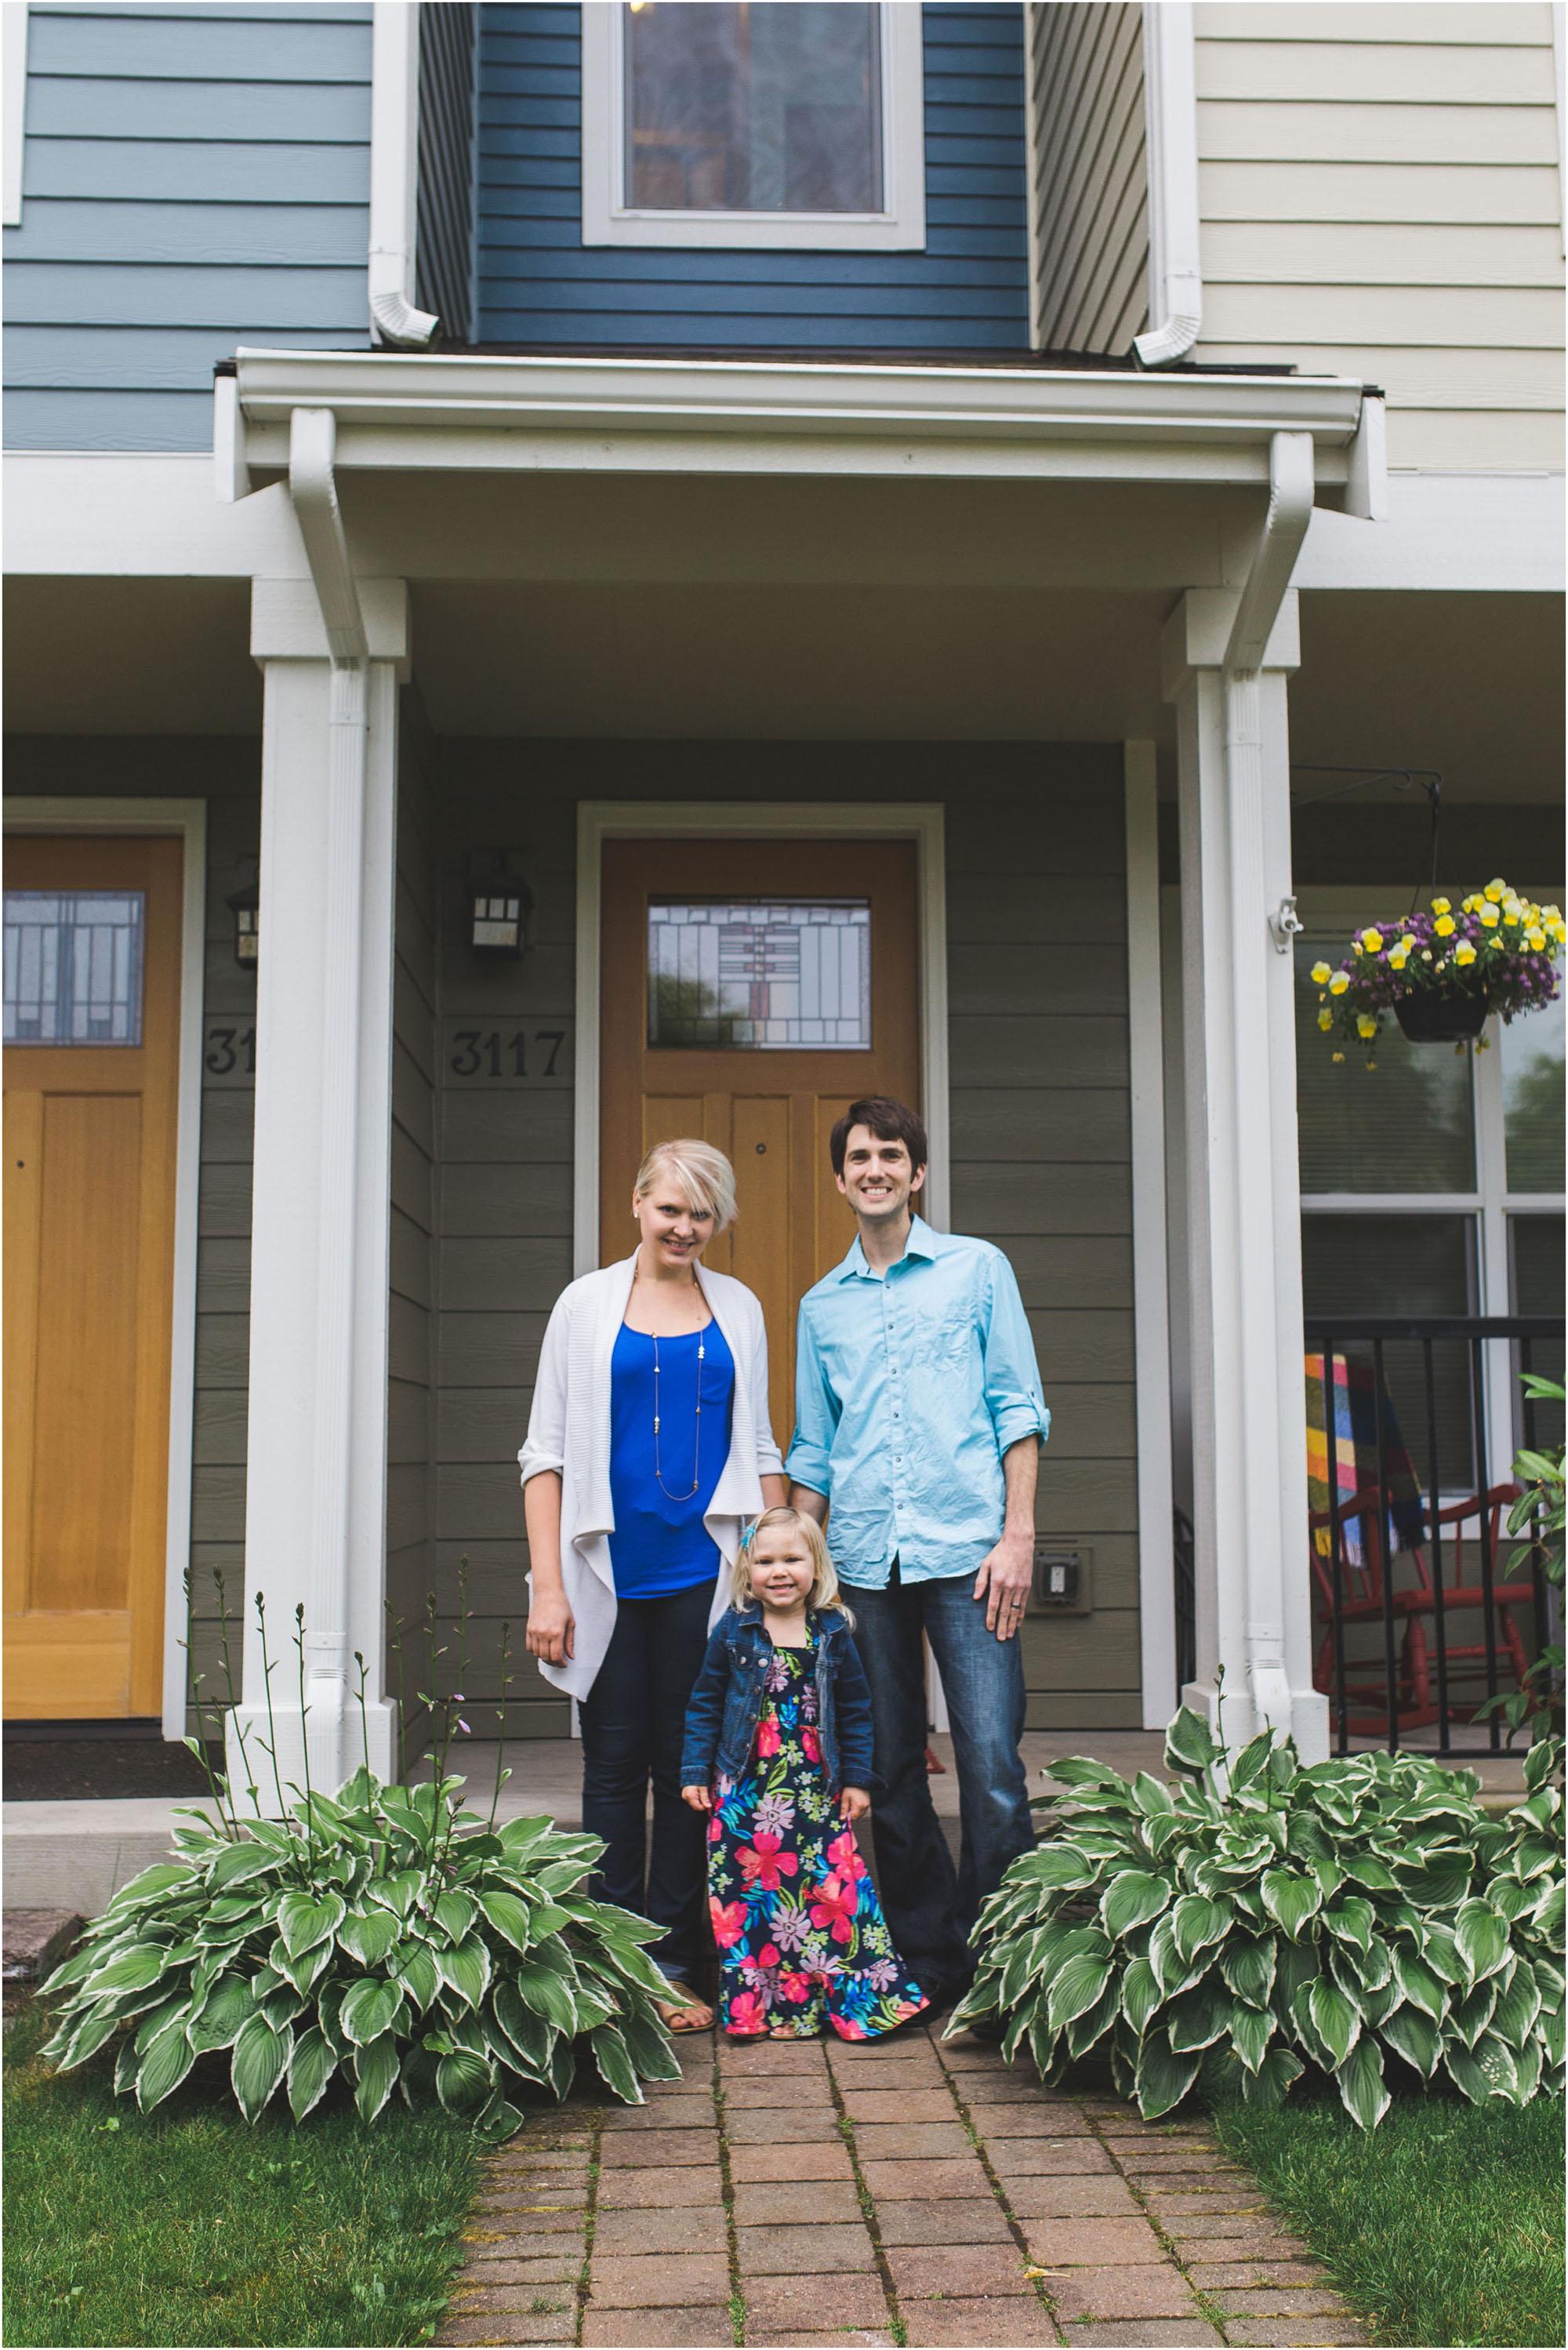 ashley vos photography seattle lifestyle family photographer_0200a.jpg